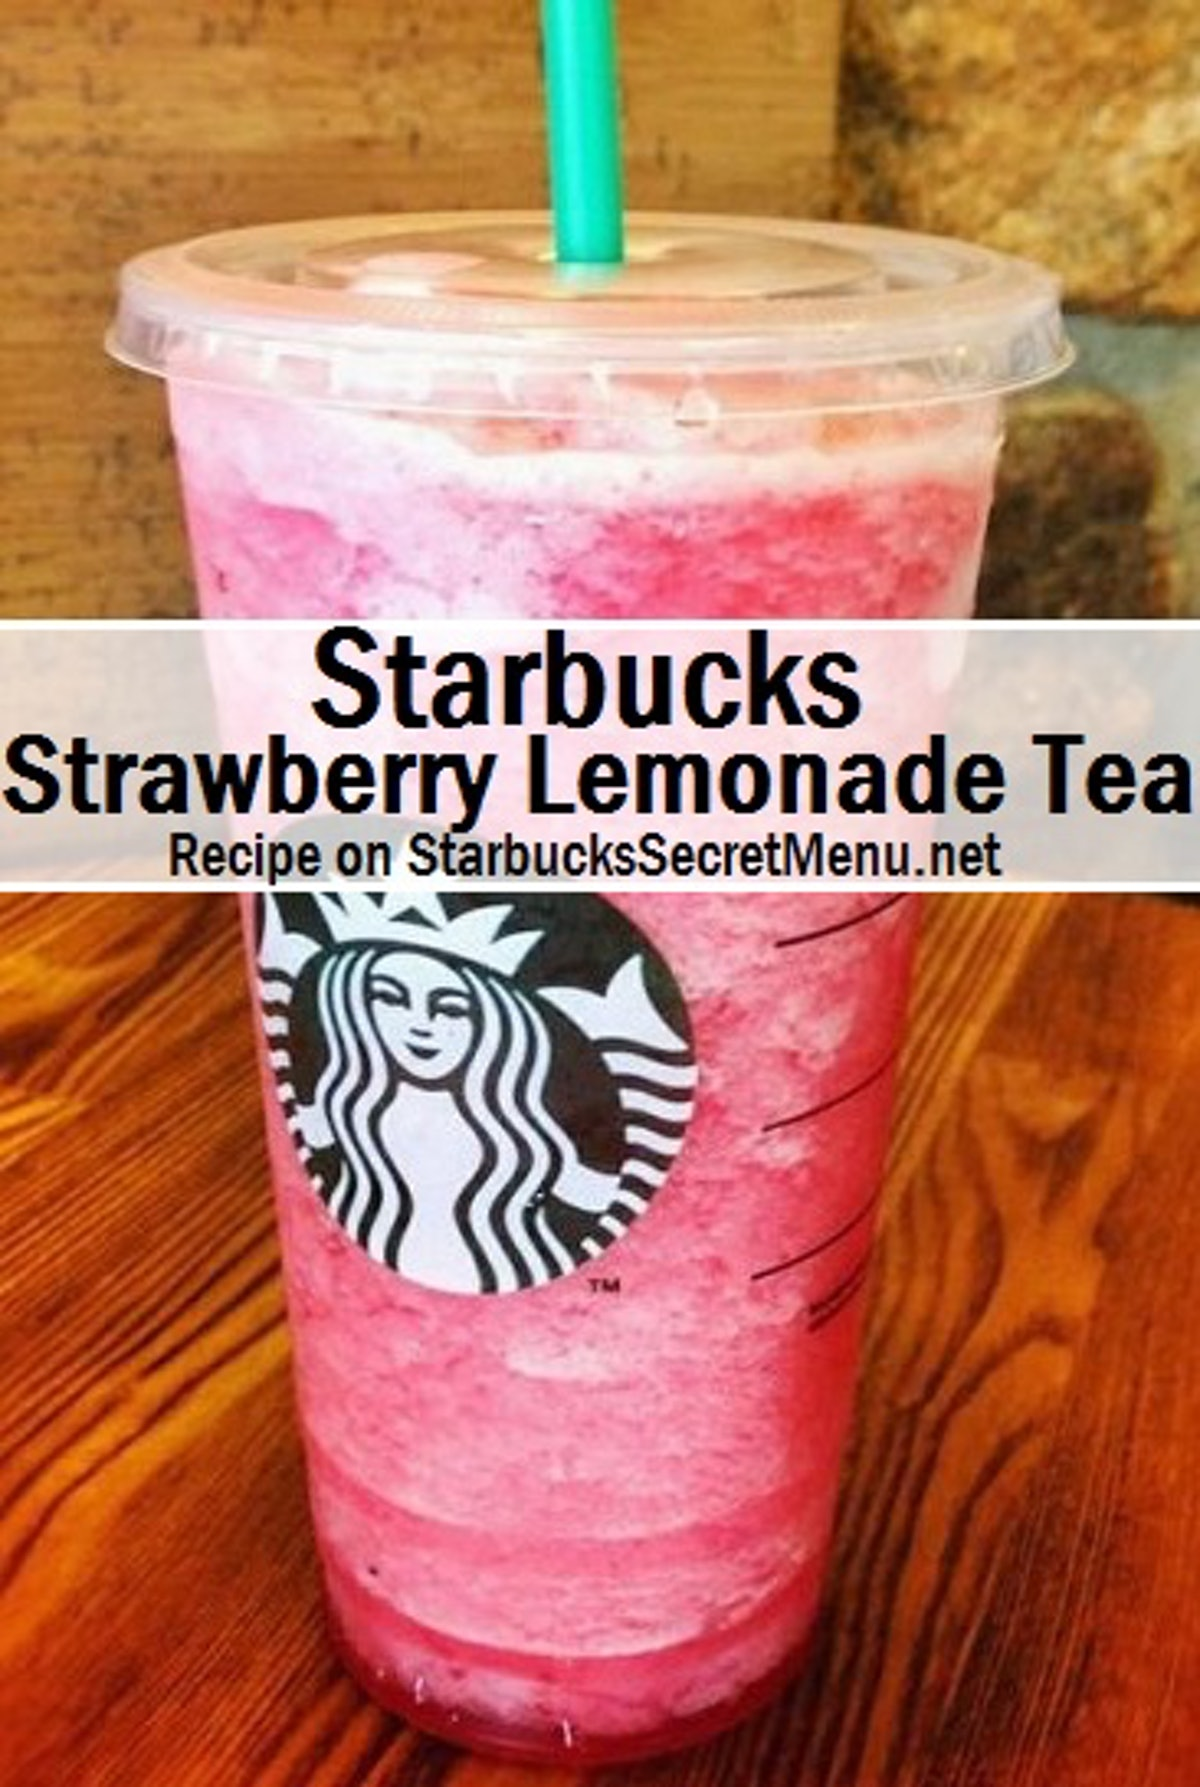 These Starbucks secret menu Valentine's Day 2021 drinks include a strawberry lemonade.